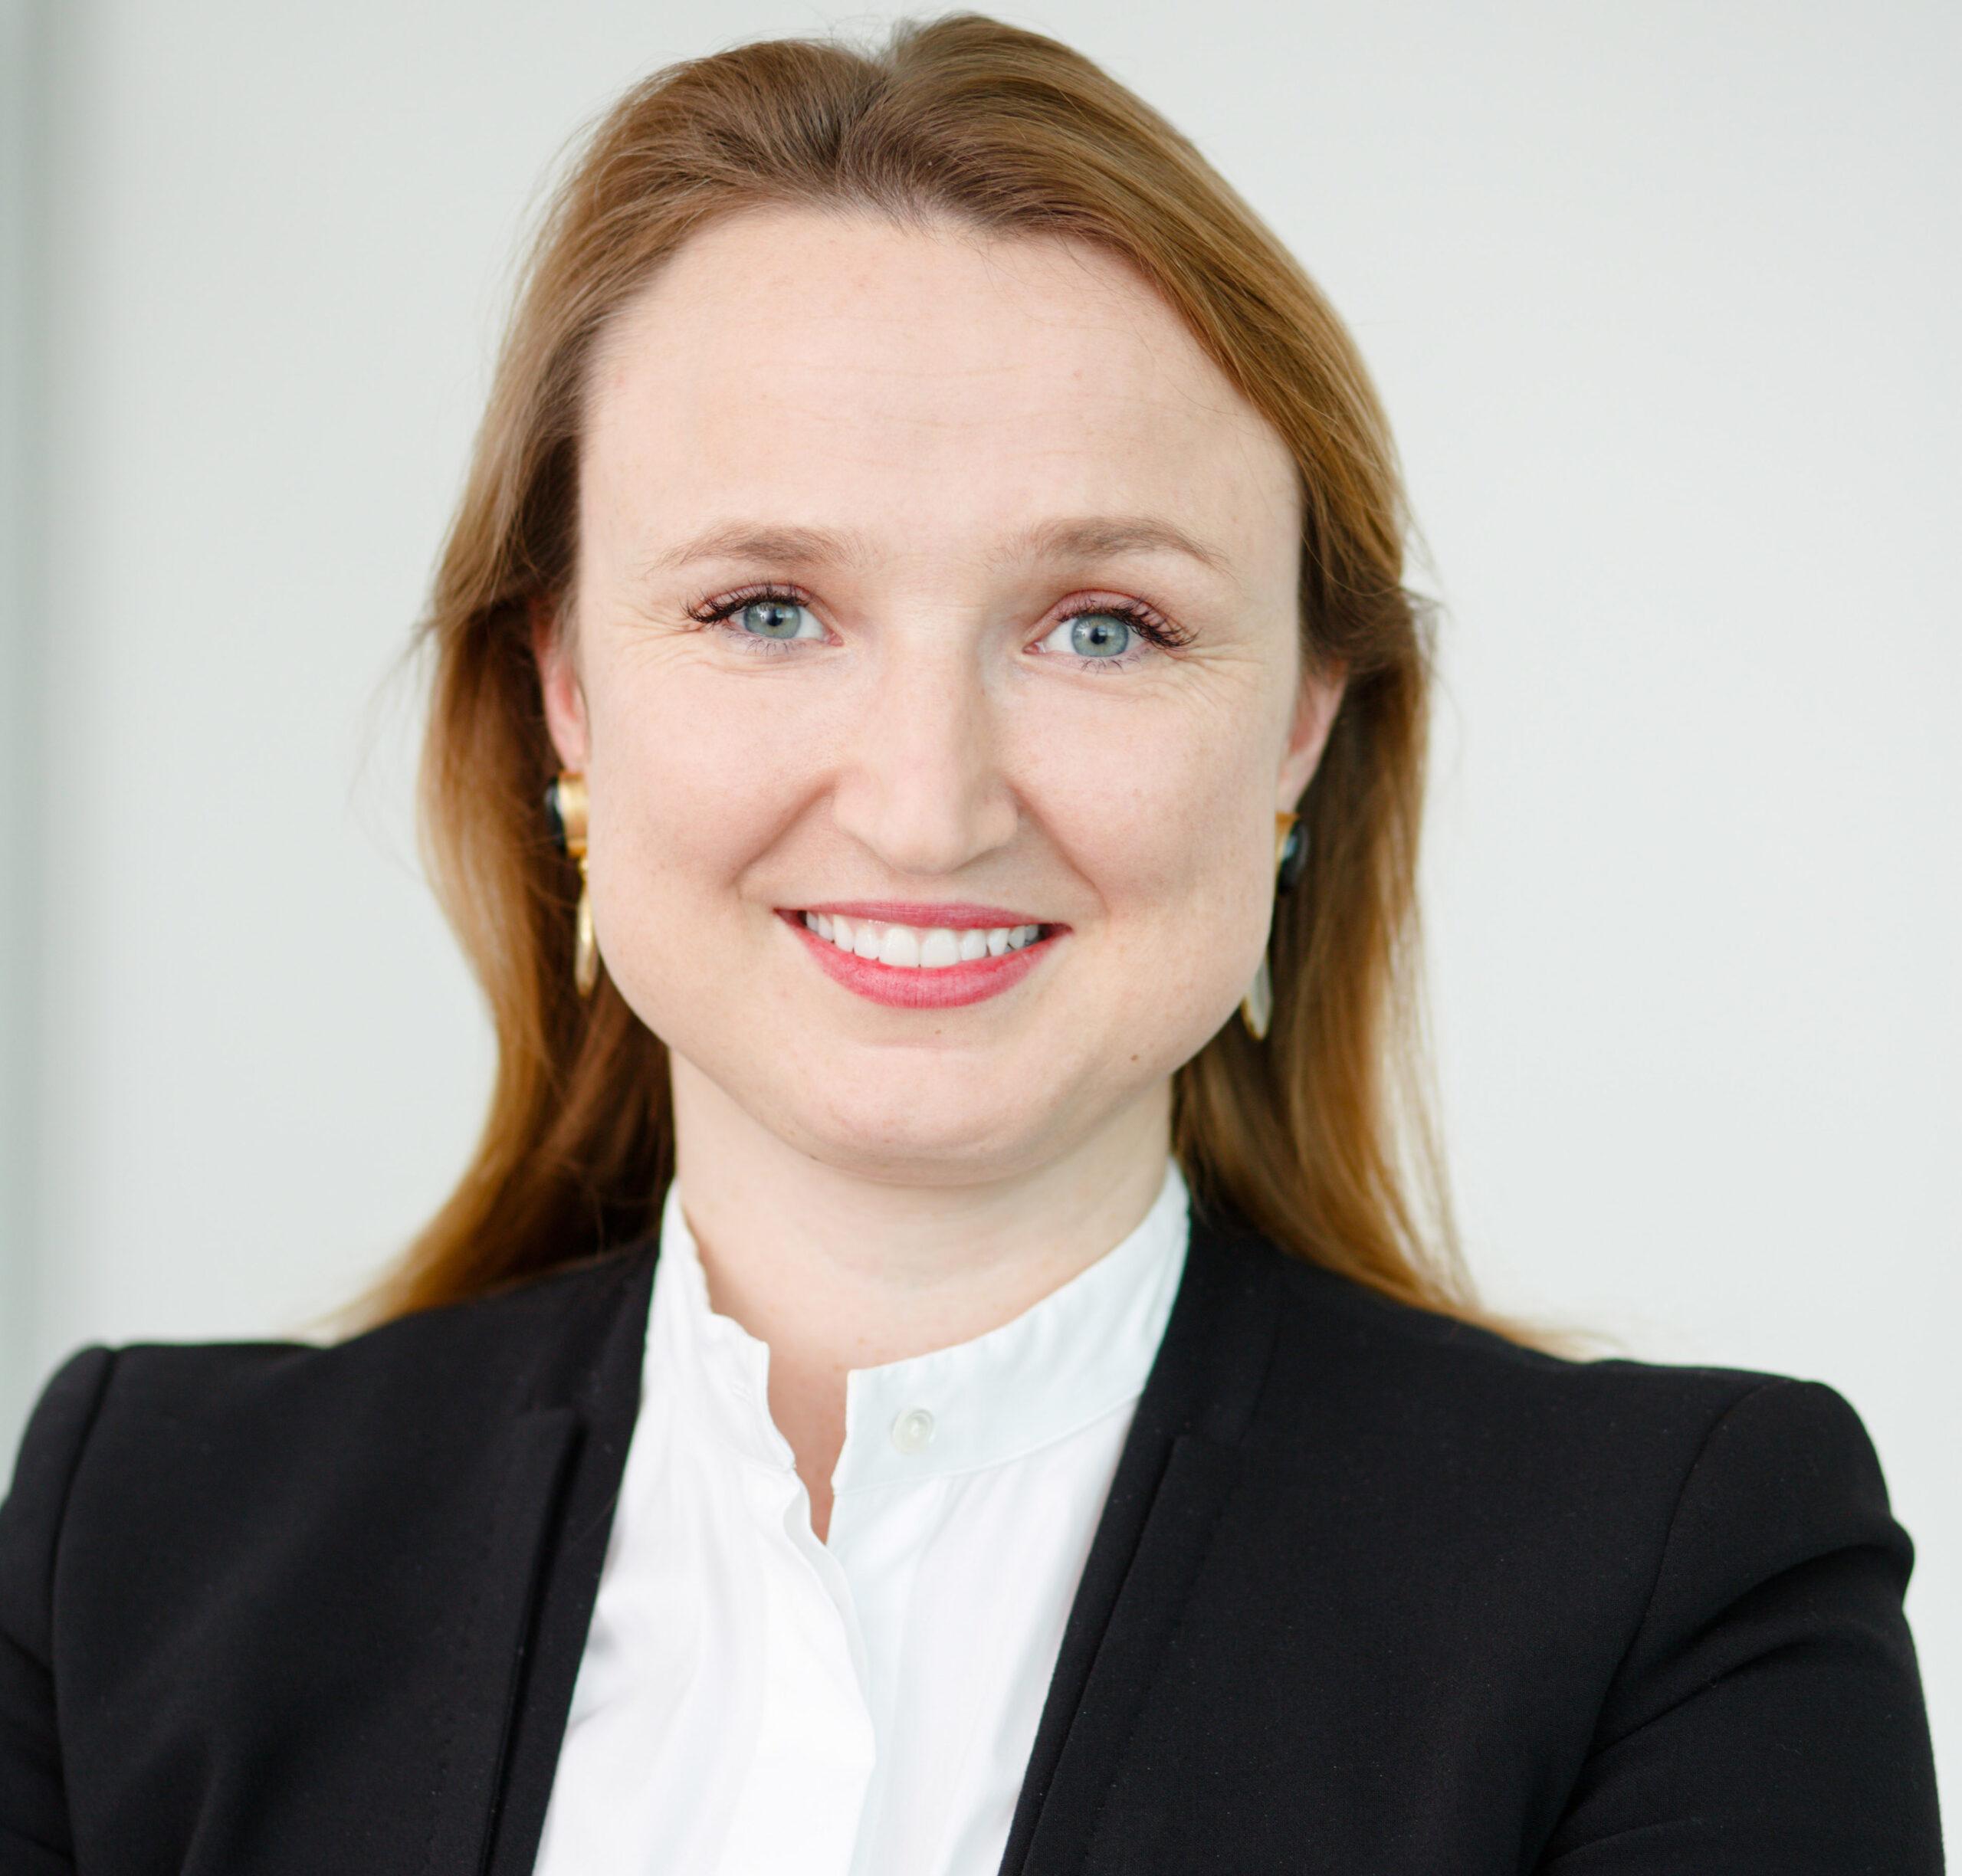 Gesichter Juliane Schmitz-Engels